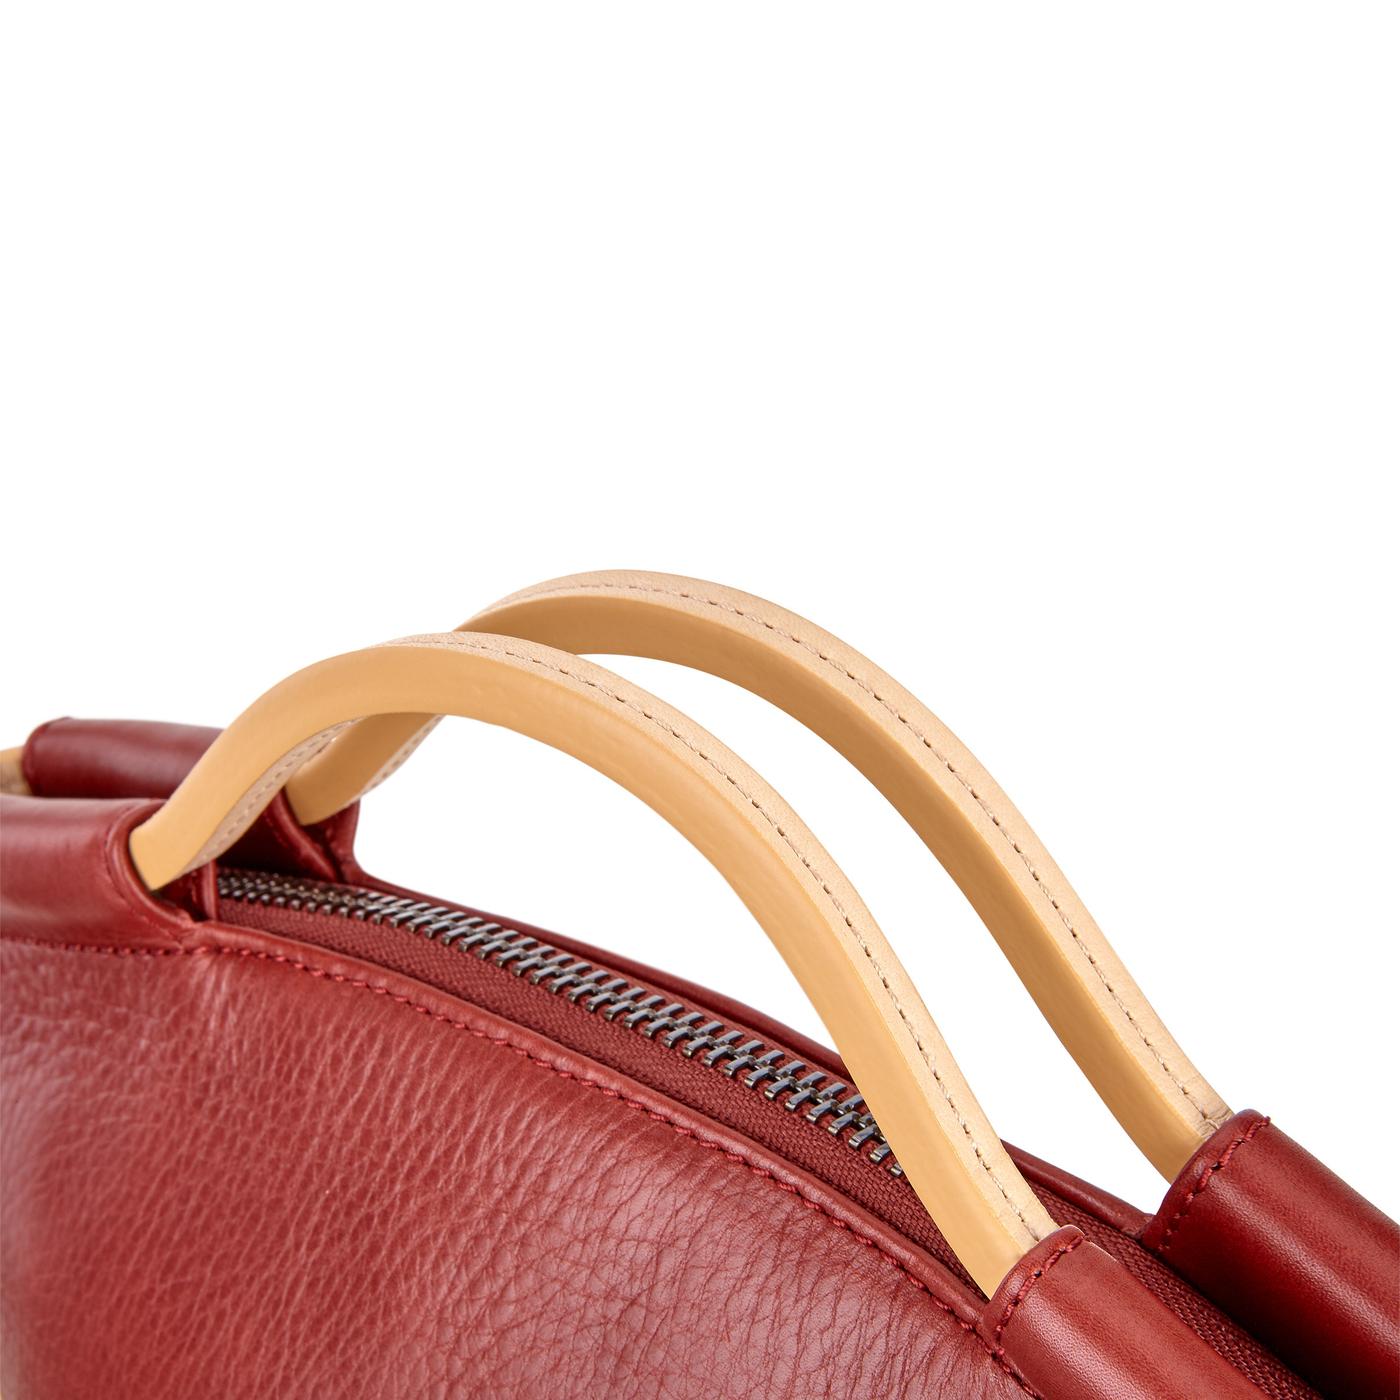 ECCO SP2 Vesper Small Doctor's Bag